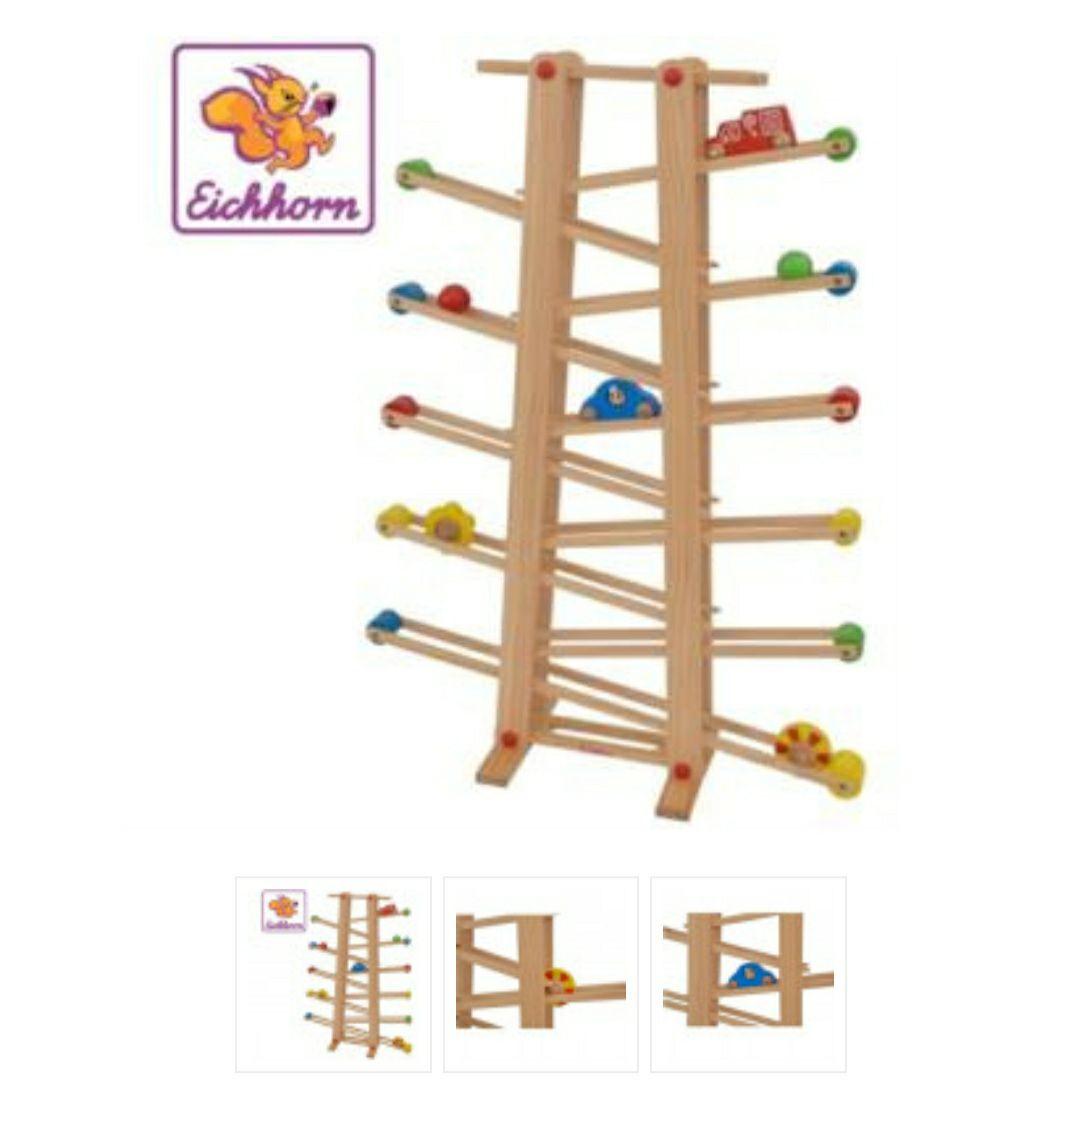 Simba Eichhorn houten rollerbaan XXL